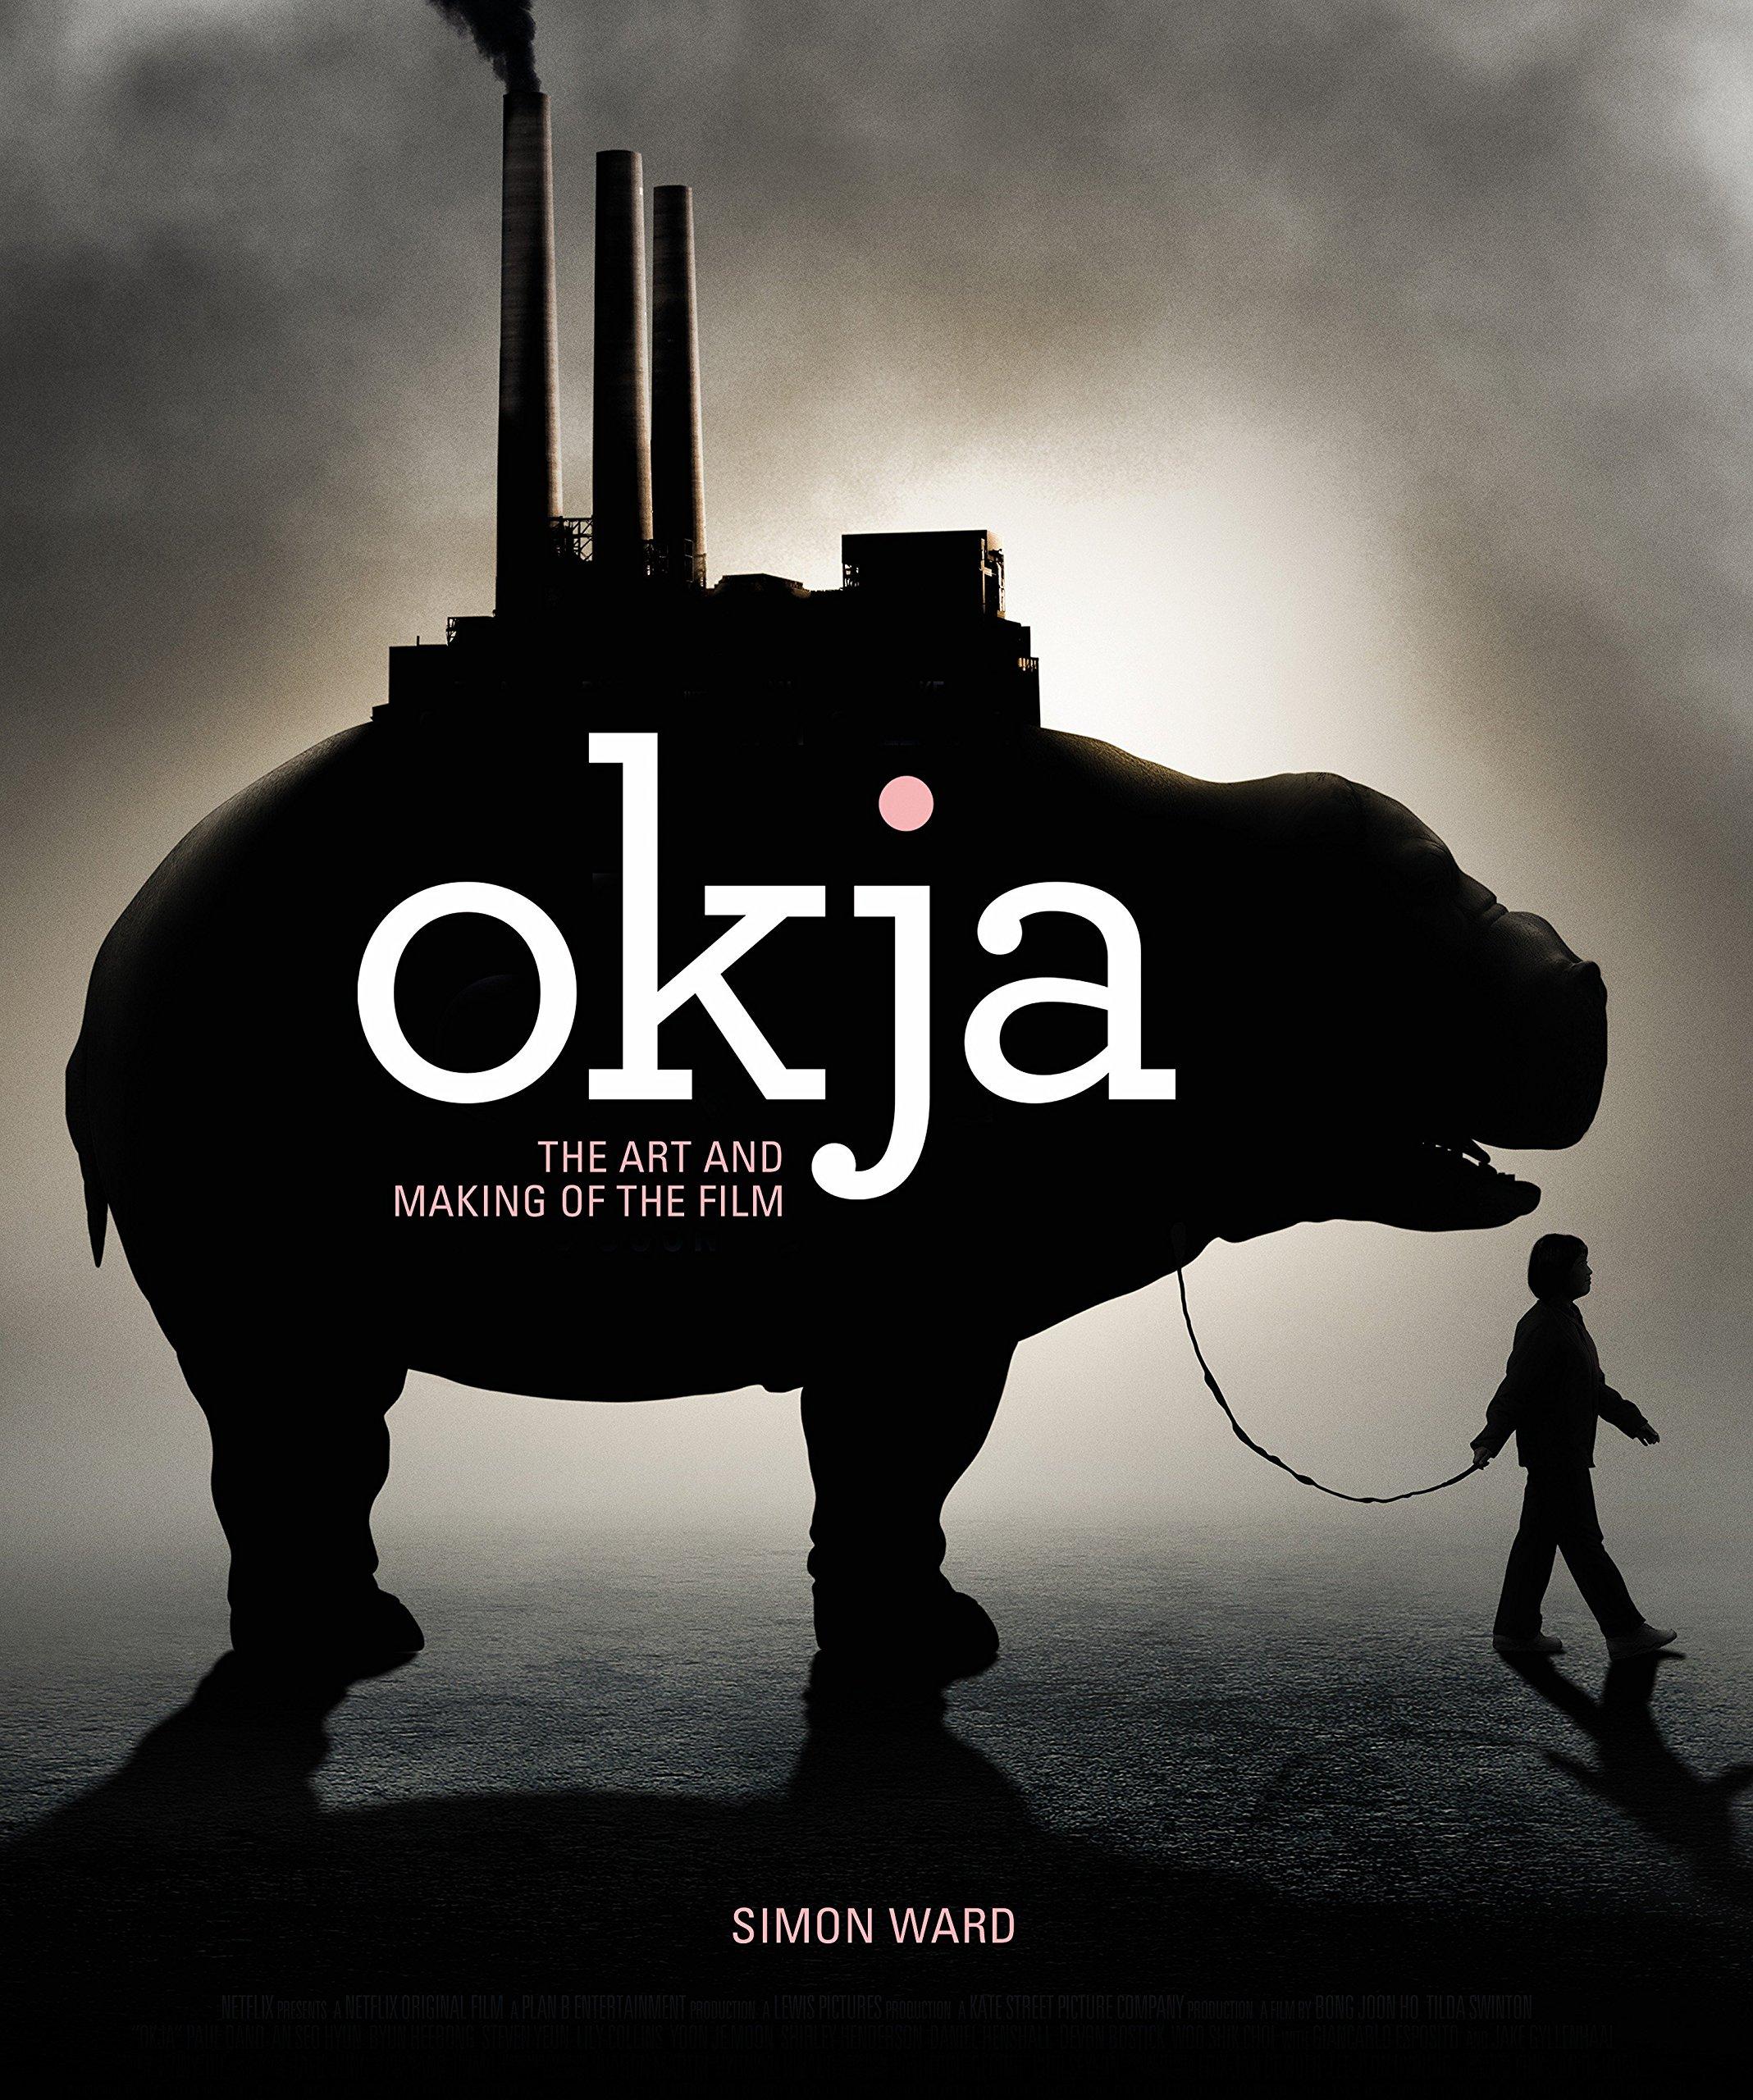 Imaginary sick in the mirror of the world cinema